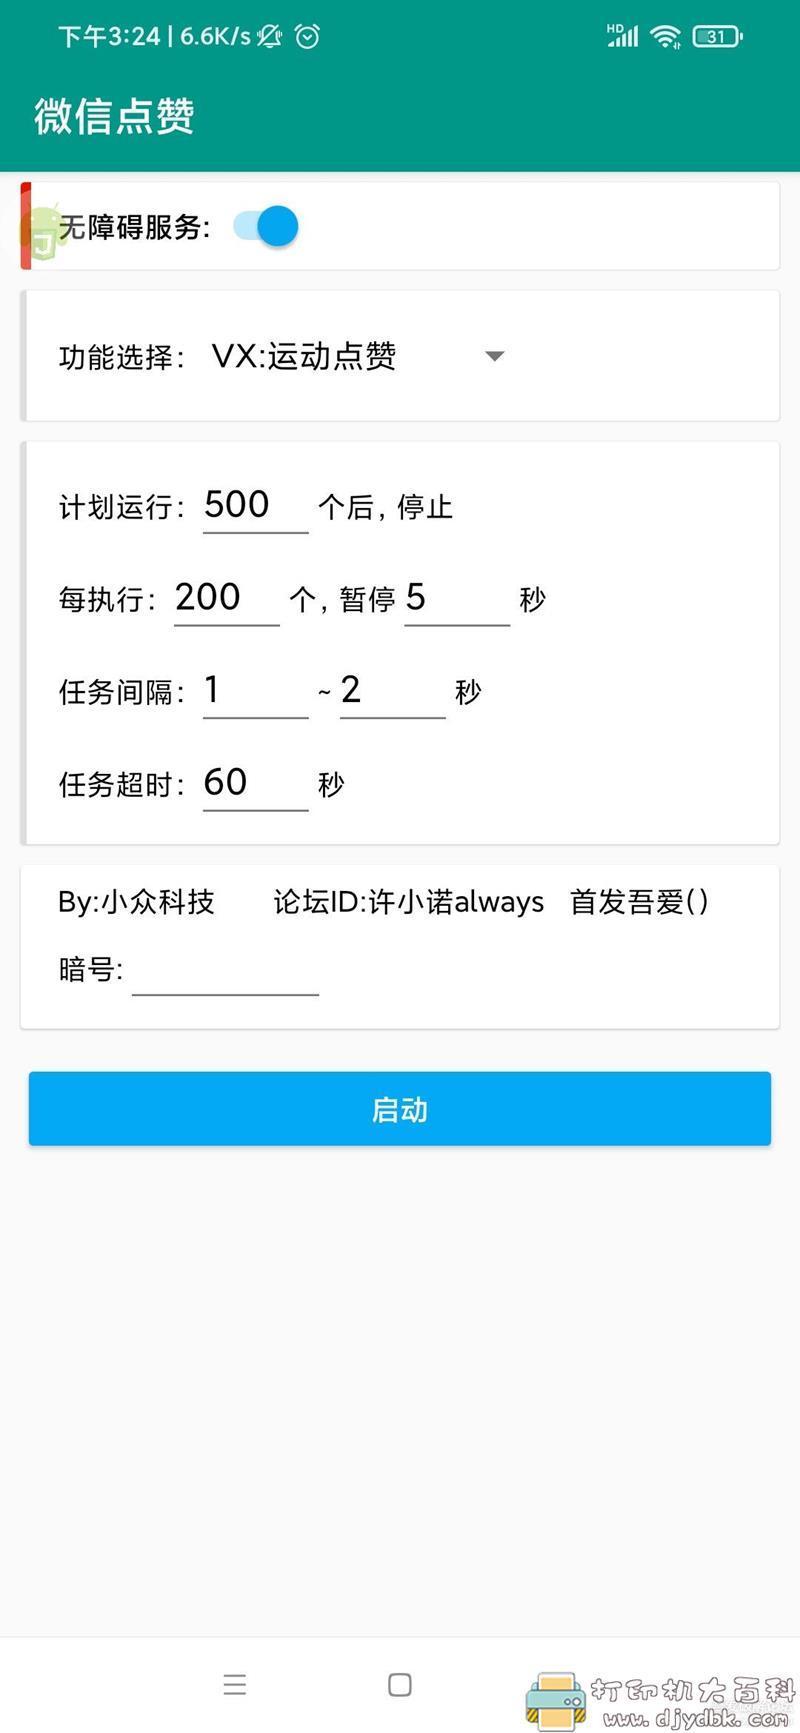 [Android]【Autojs脚本】微信运动点赞和朋友圈点赞 version8.0.2最新版本 配图 No.1